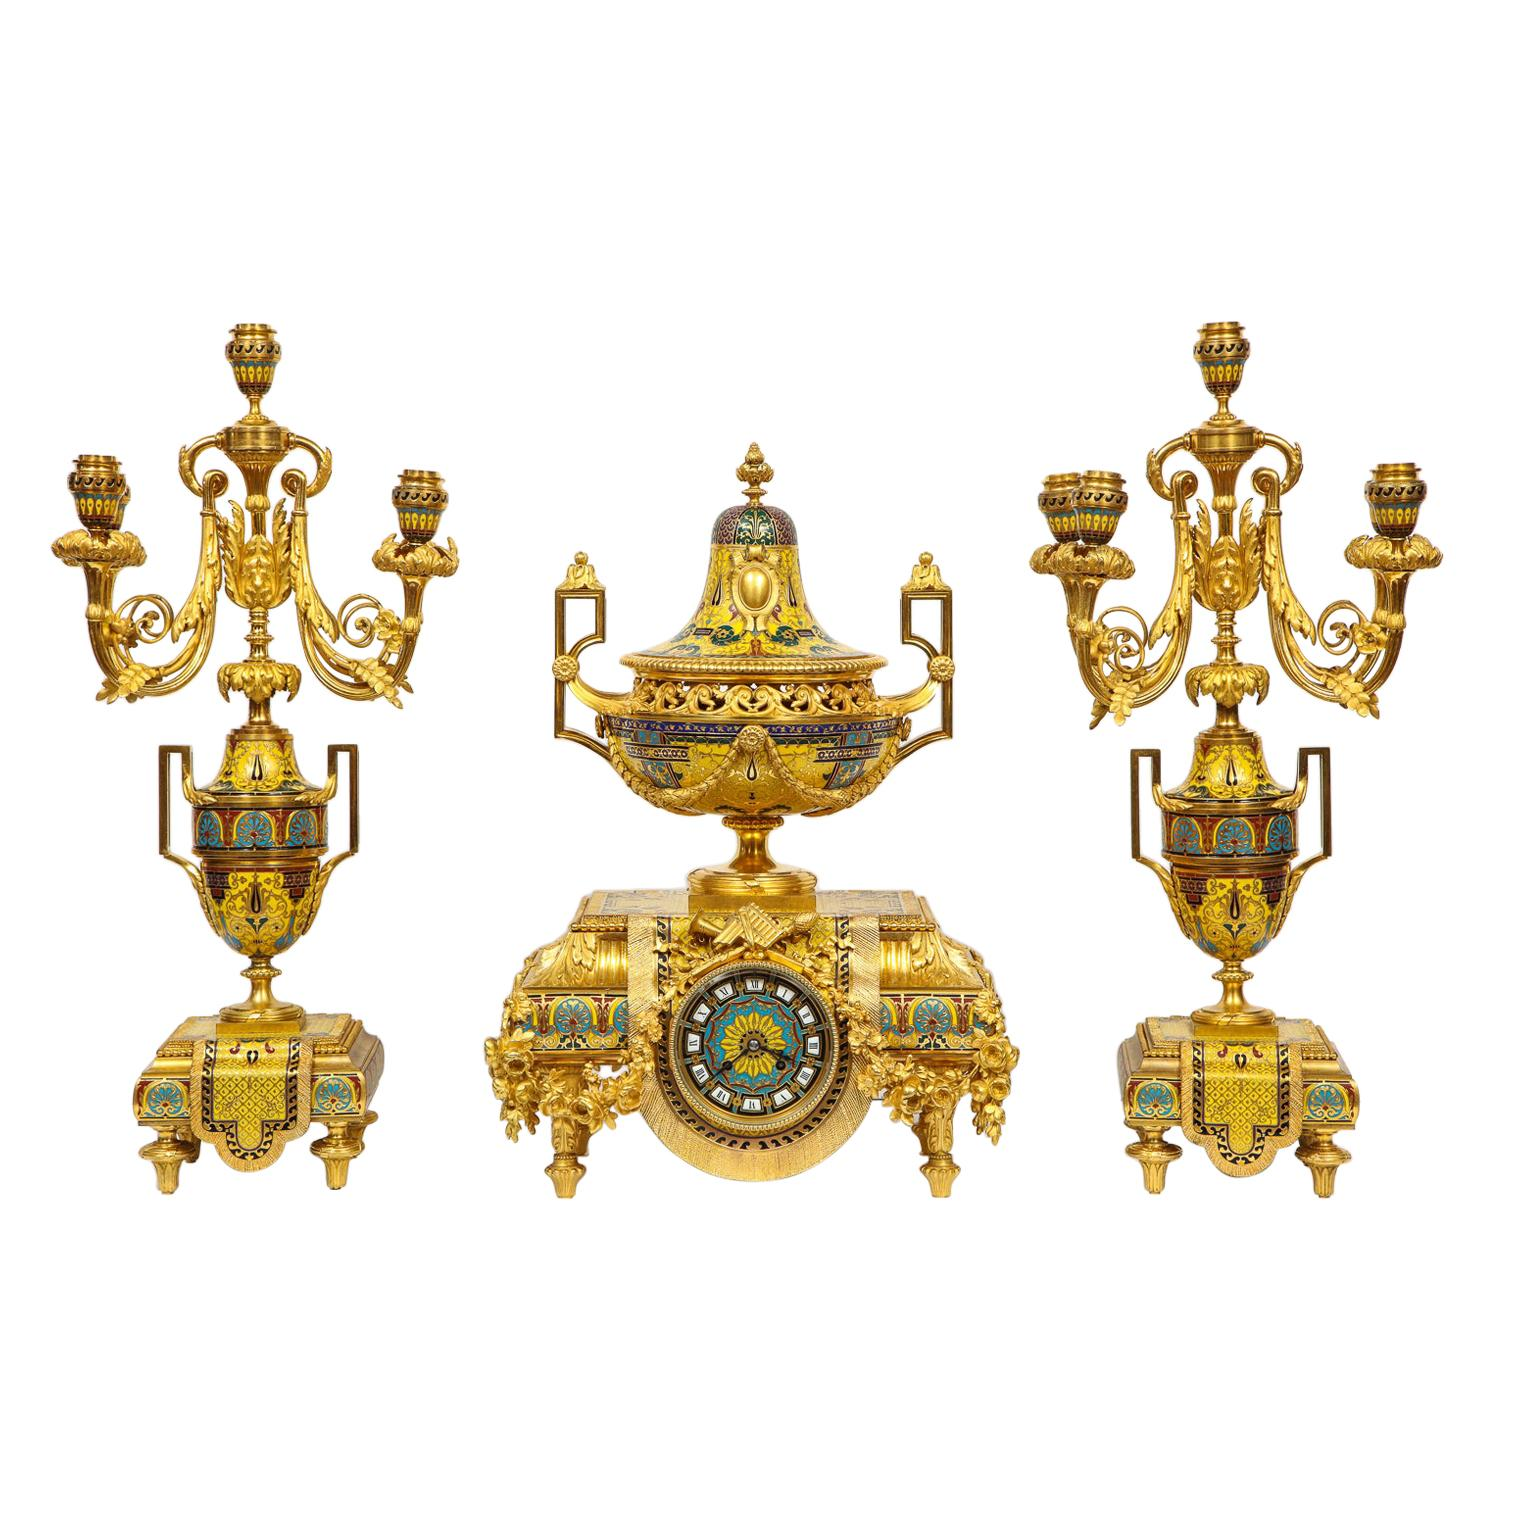 Ferdinand Barbedienne, Museum Quality French Ormolu Champleve Enamel Clock Set